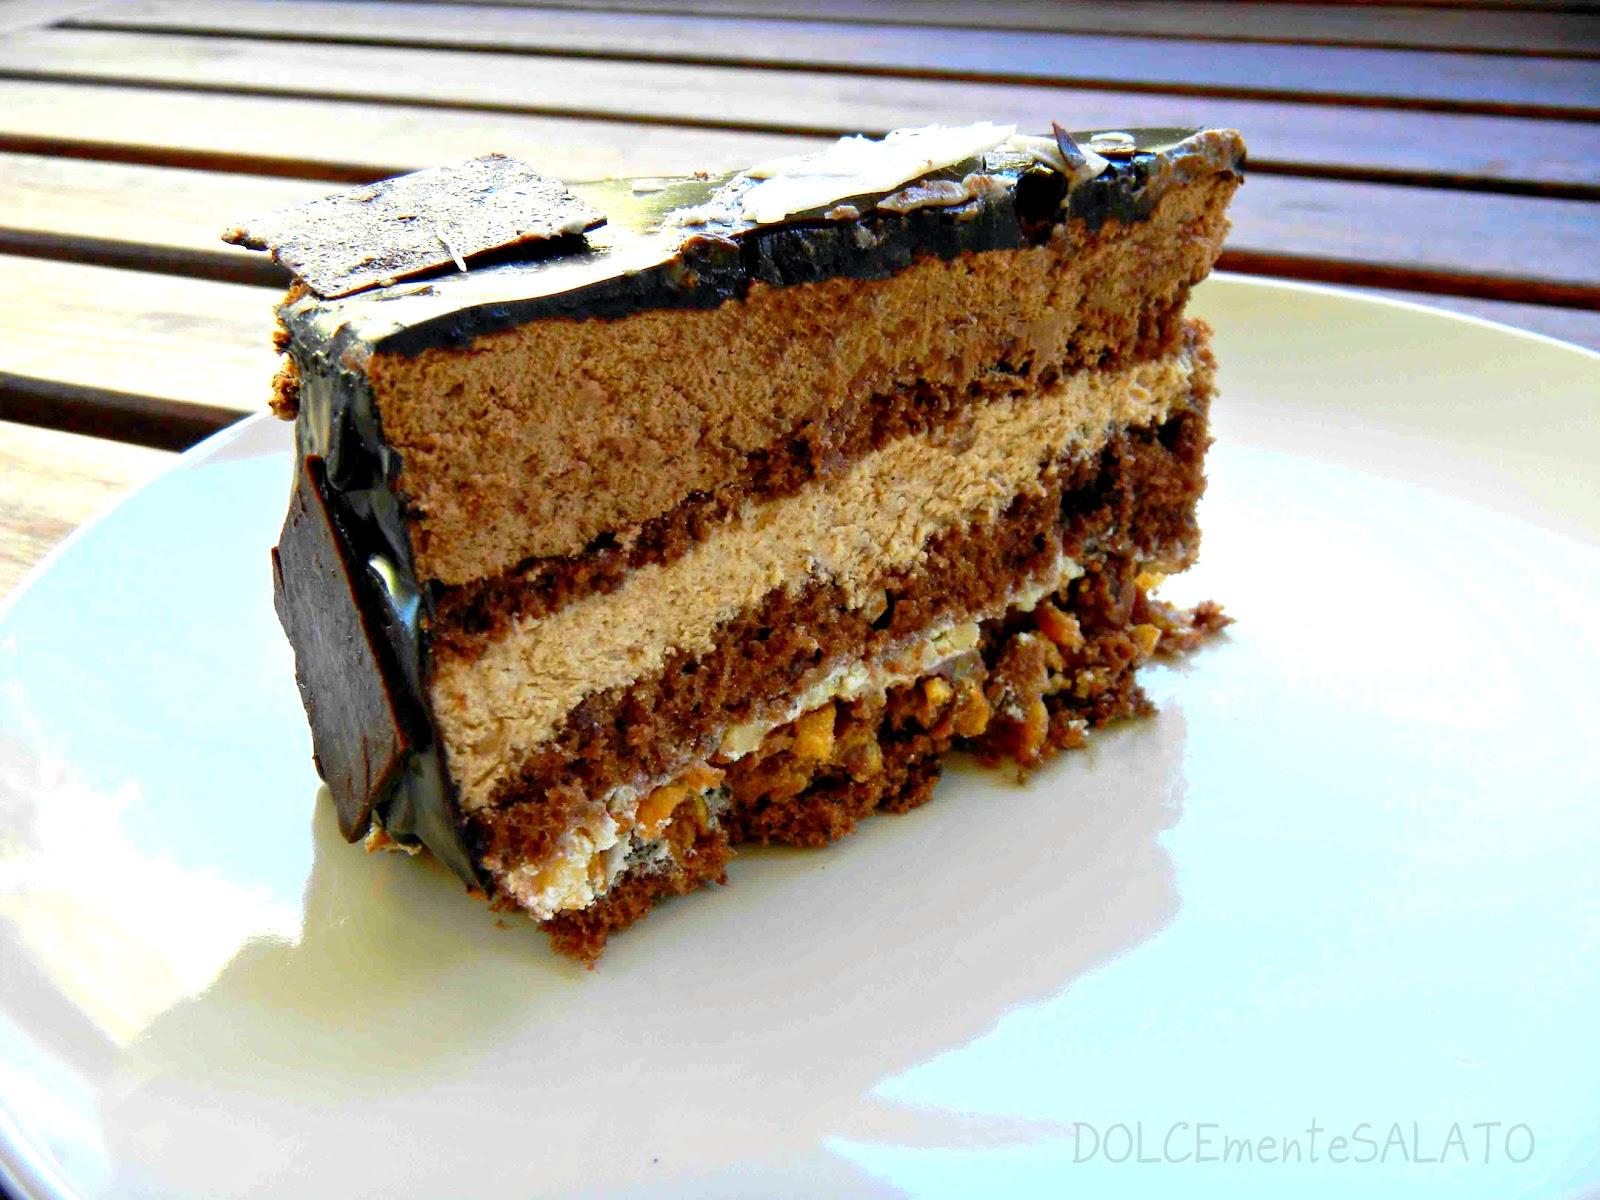 Ricetta base per torte dolci